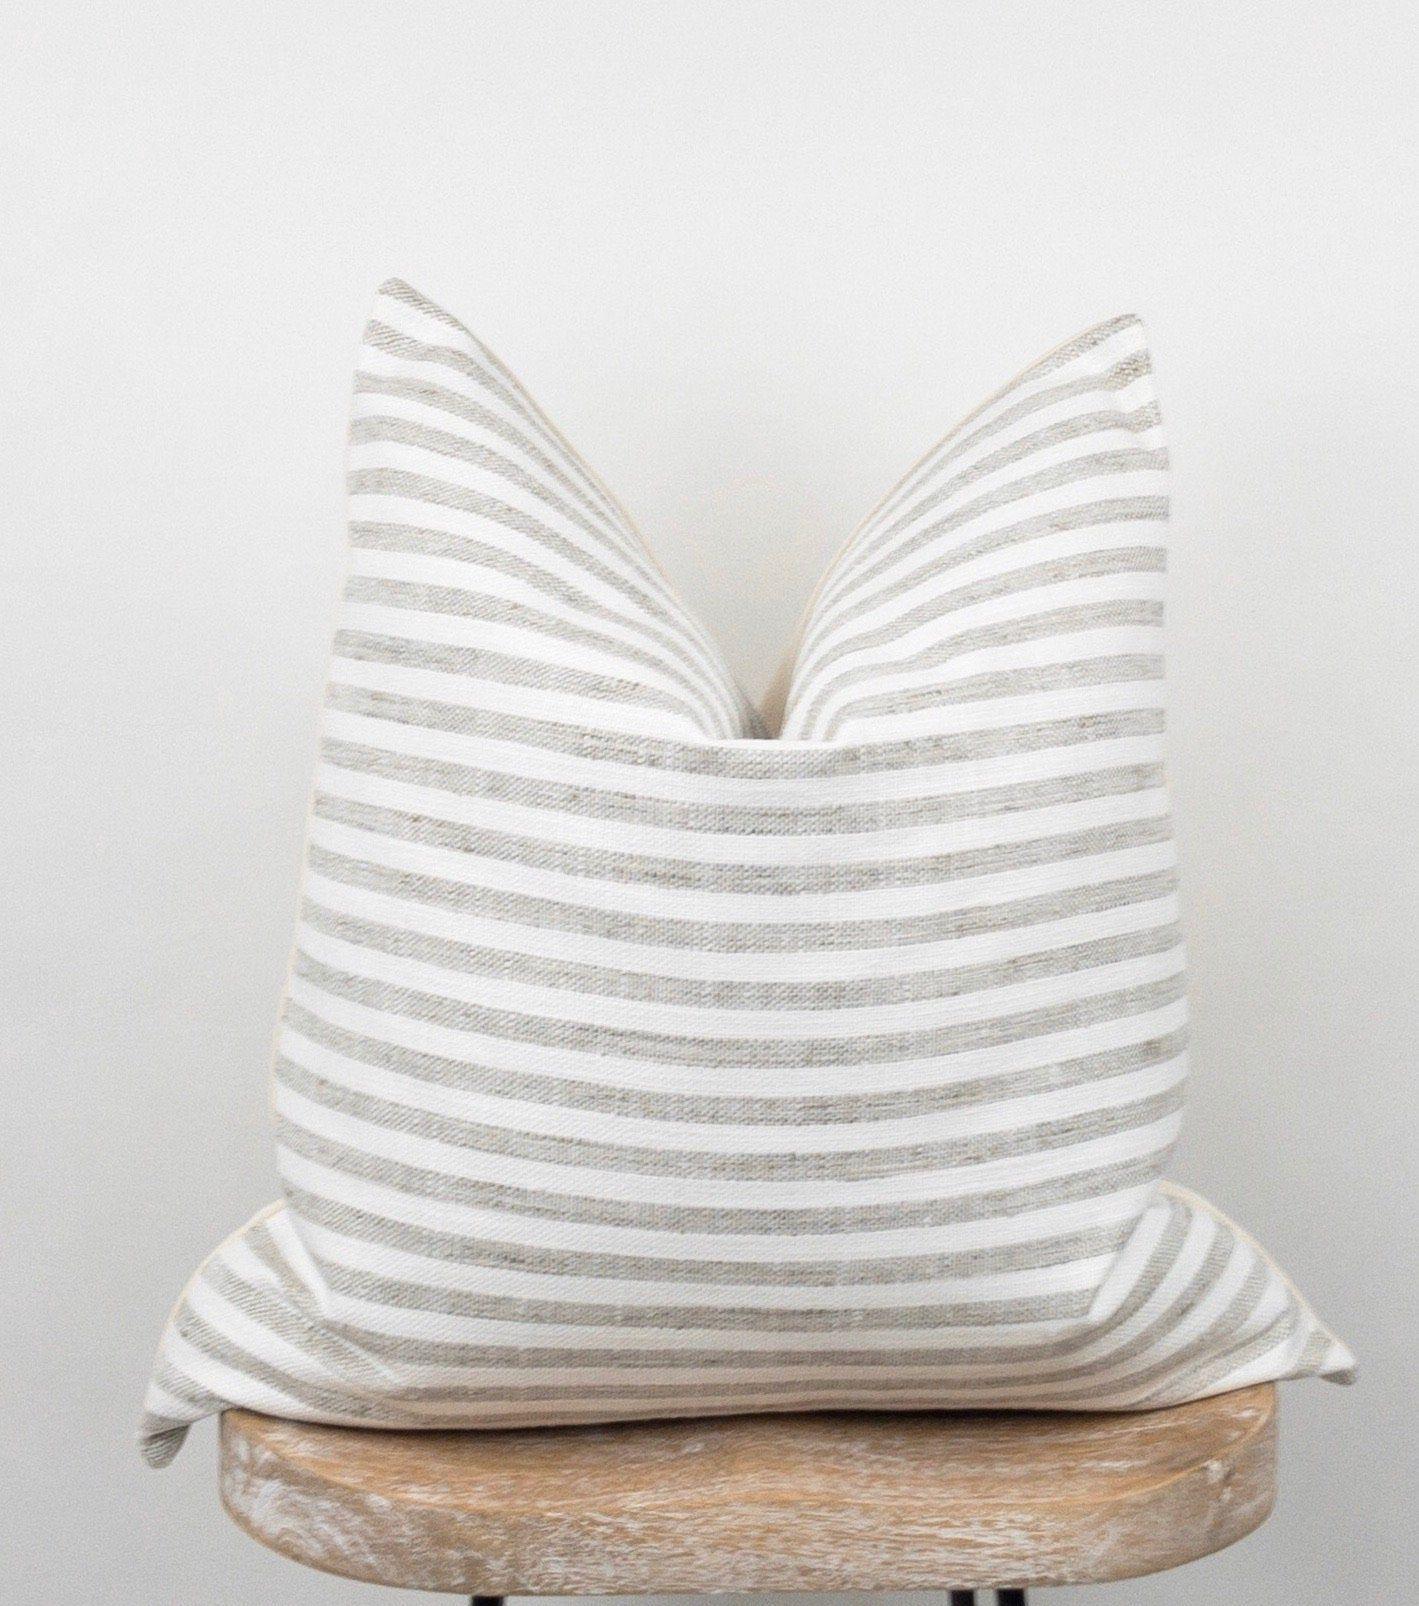 Stripe Farmhouse Pillow Cover Gray And White Pillow Modern Pillow Case Niklas In 2020 Modern Pillow Cases Modern Pillows White Pillows